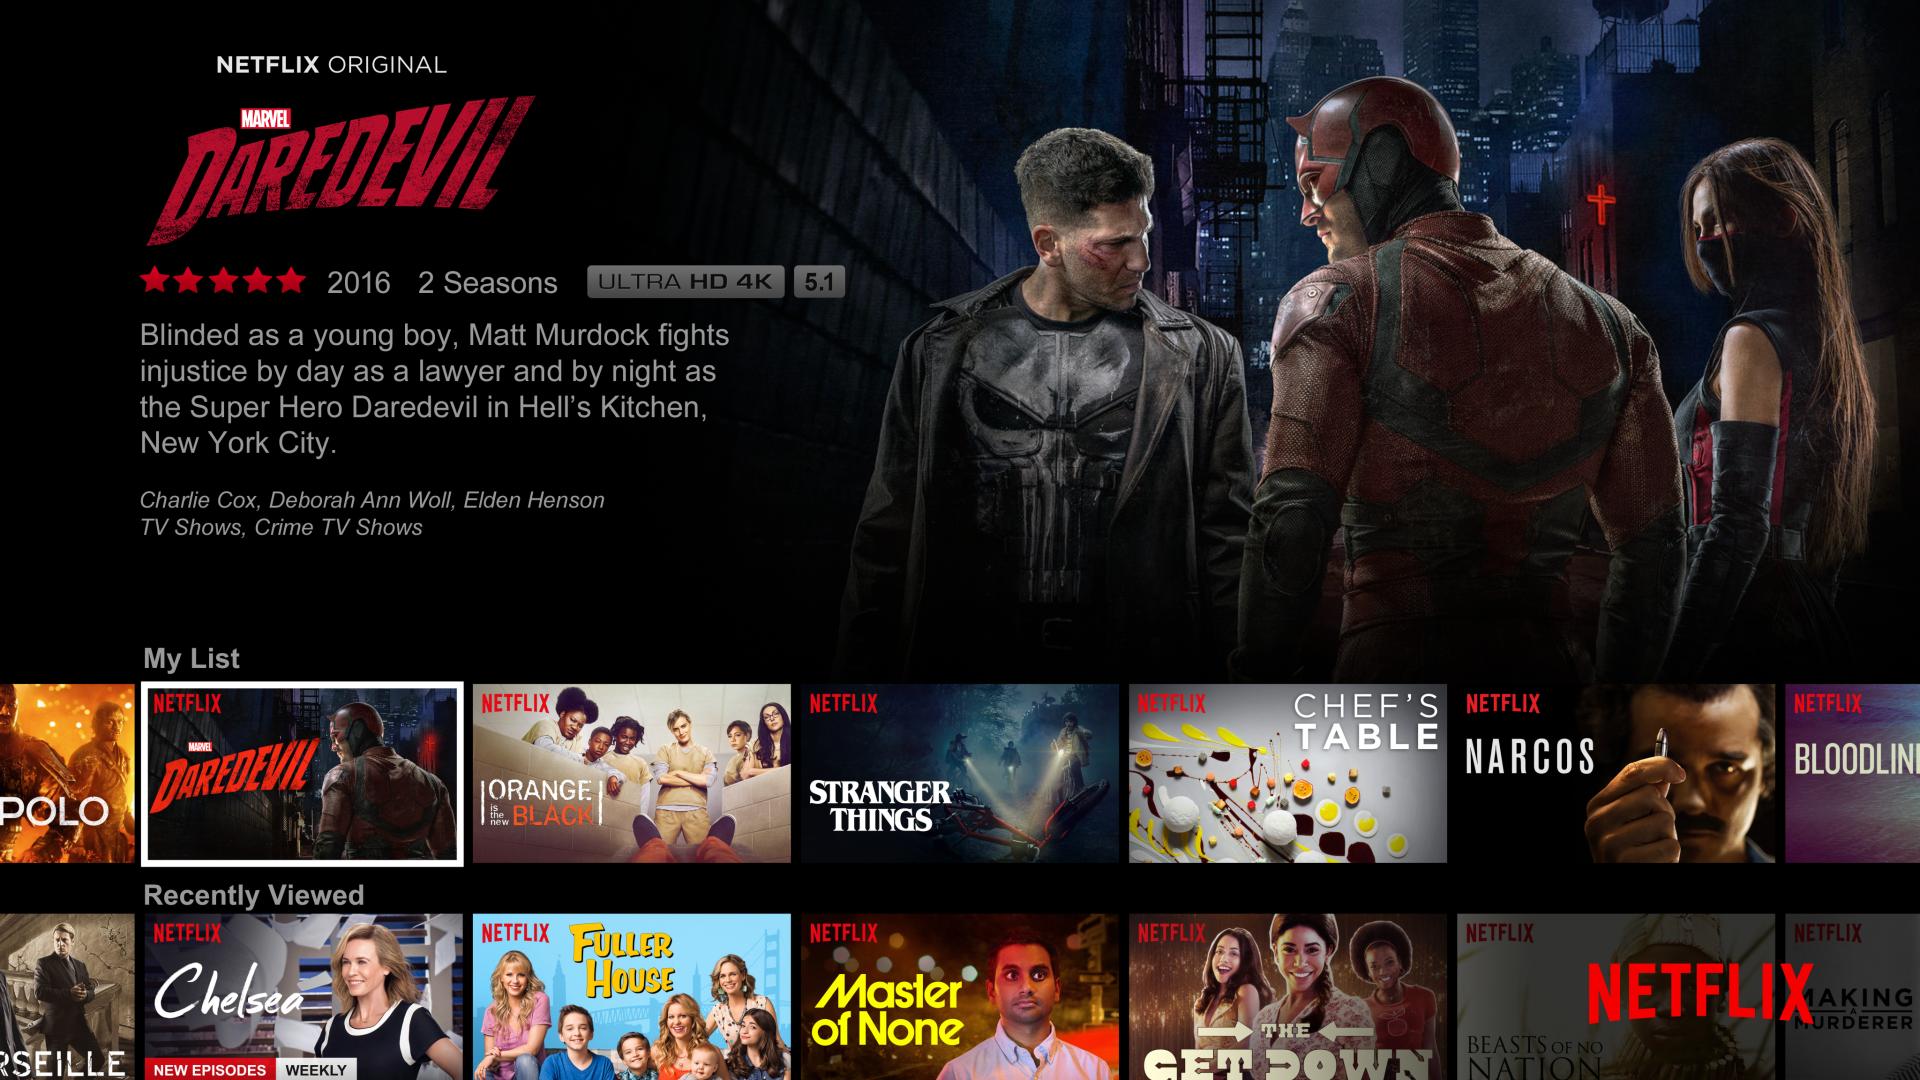 A screenshot of the Netflix streaming service.